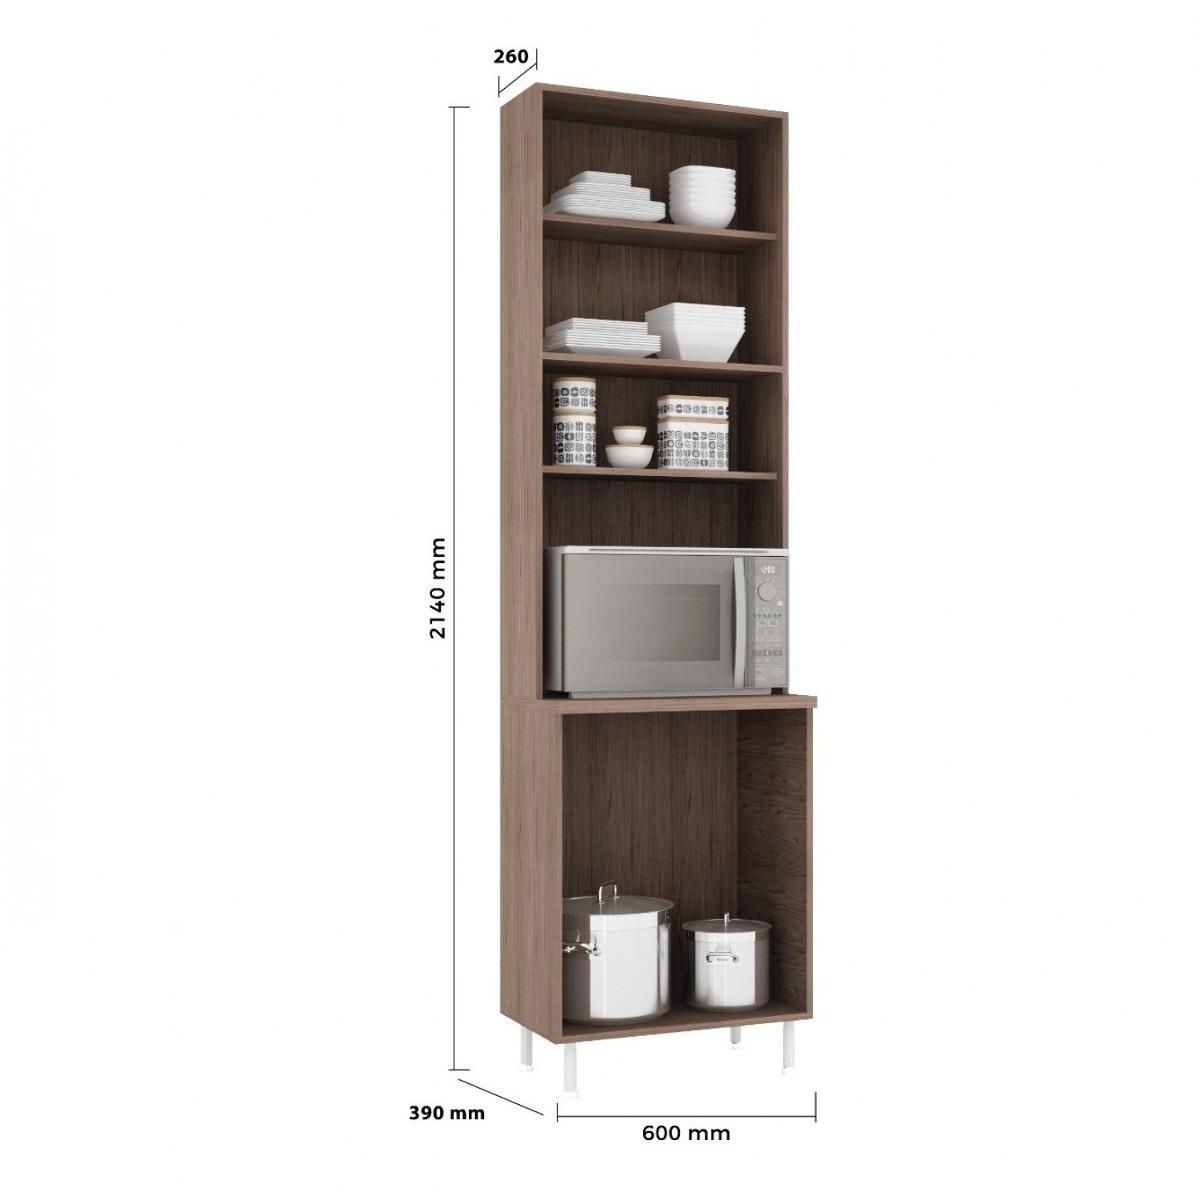 Cozinha Compacta Com Balc O It Lia Indekes N O Hd R 469 90 Em